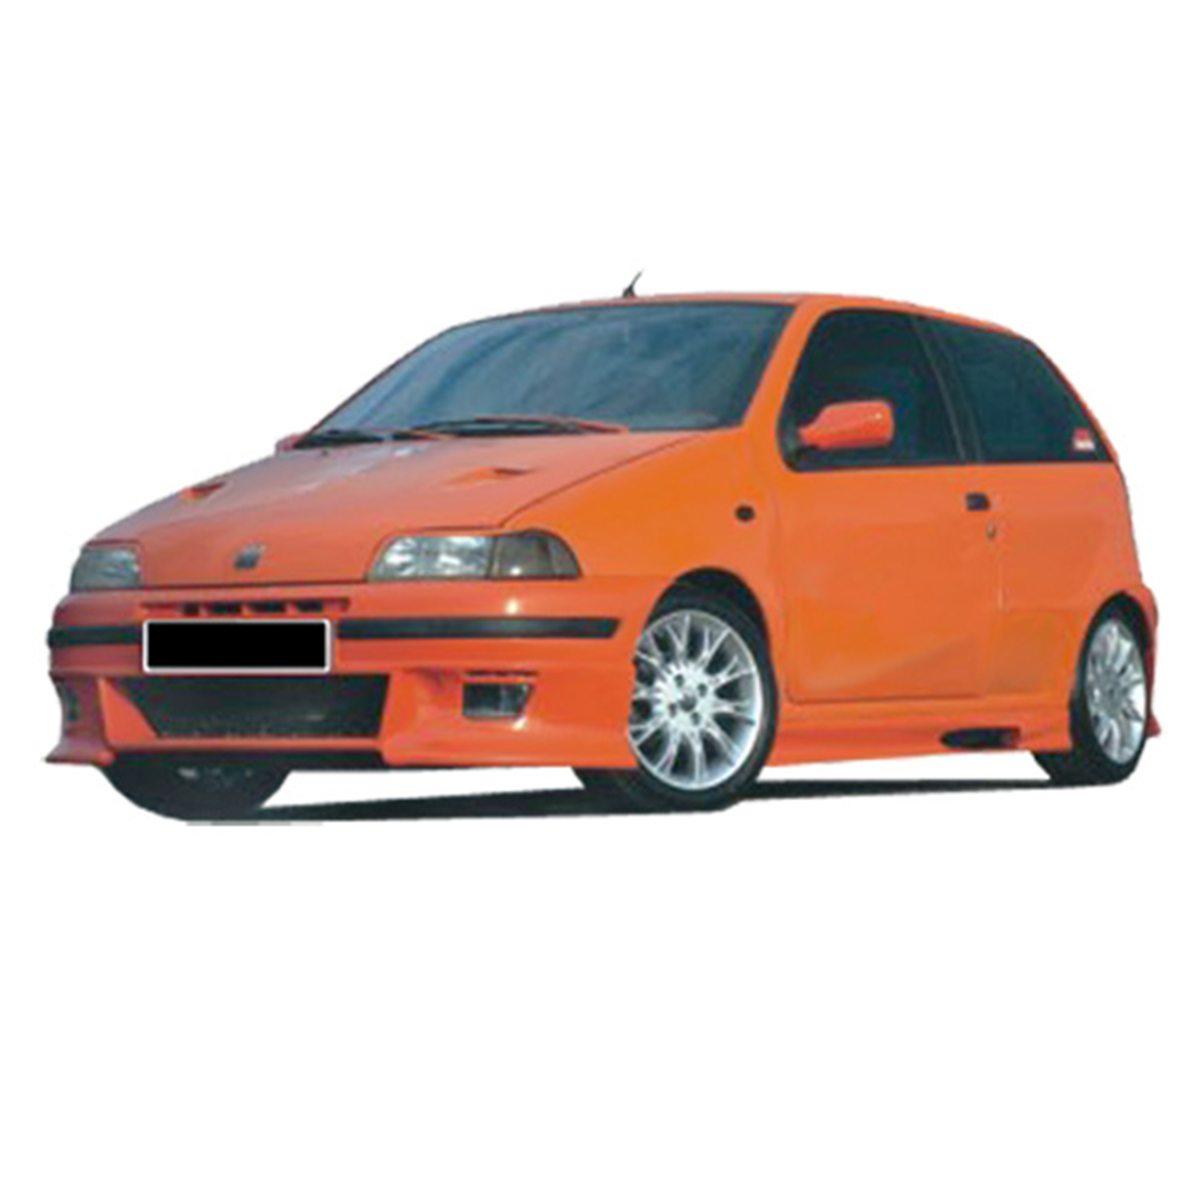 Fiat-Punto-Beast-Frt-PCU0298